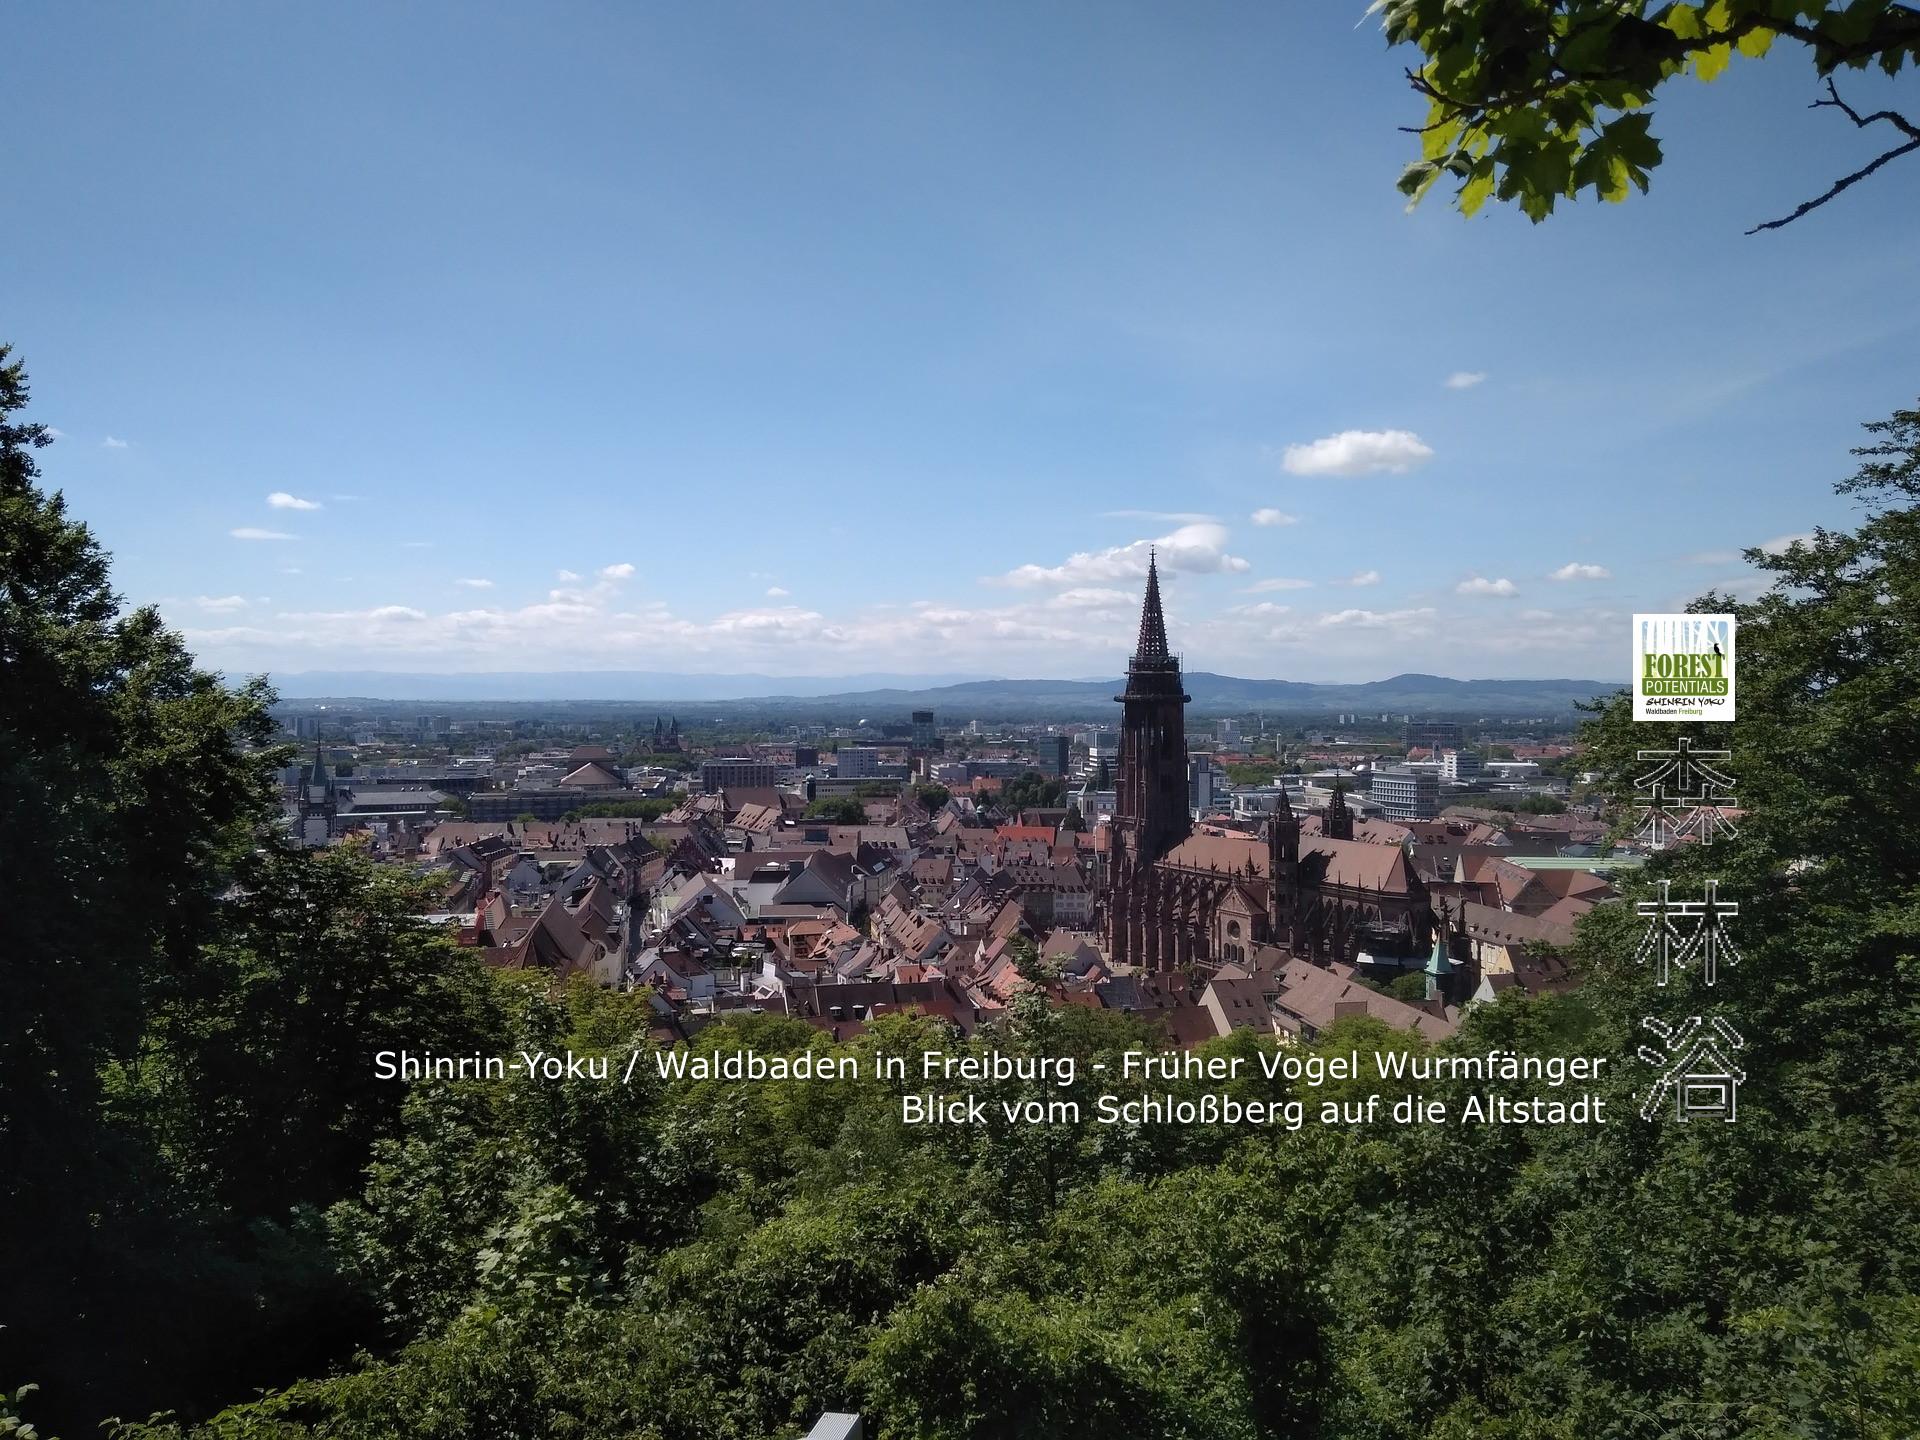 Shinrin Yoku - Waldbaden Freiburg - morgens - Schlossberg